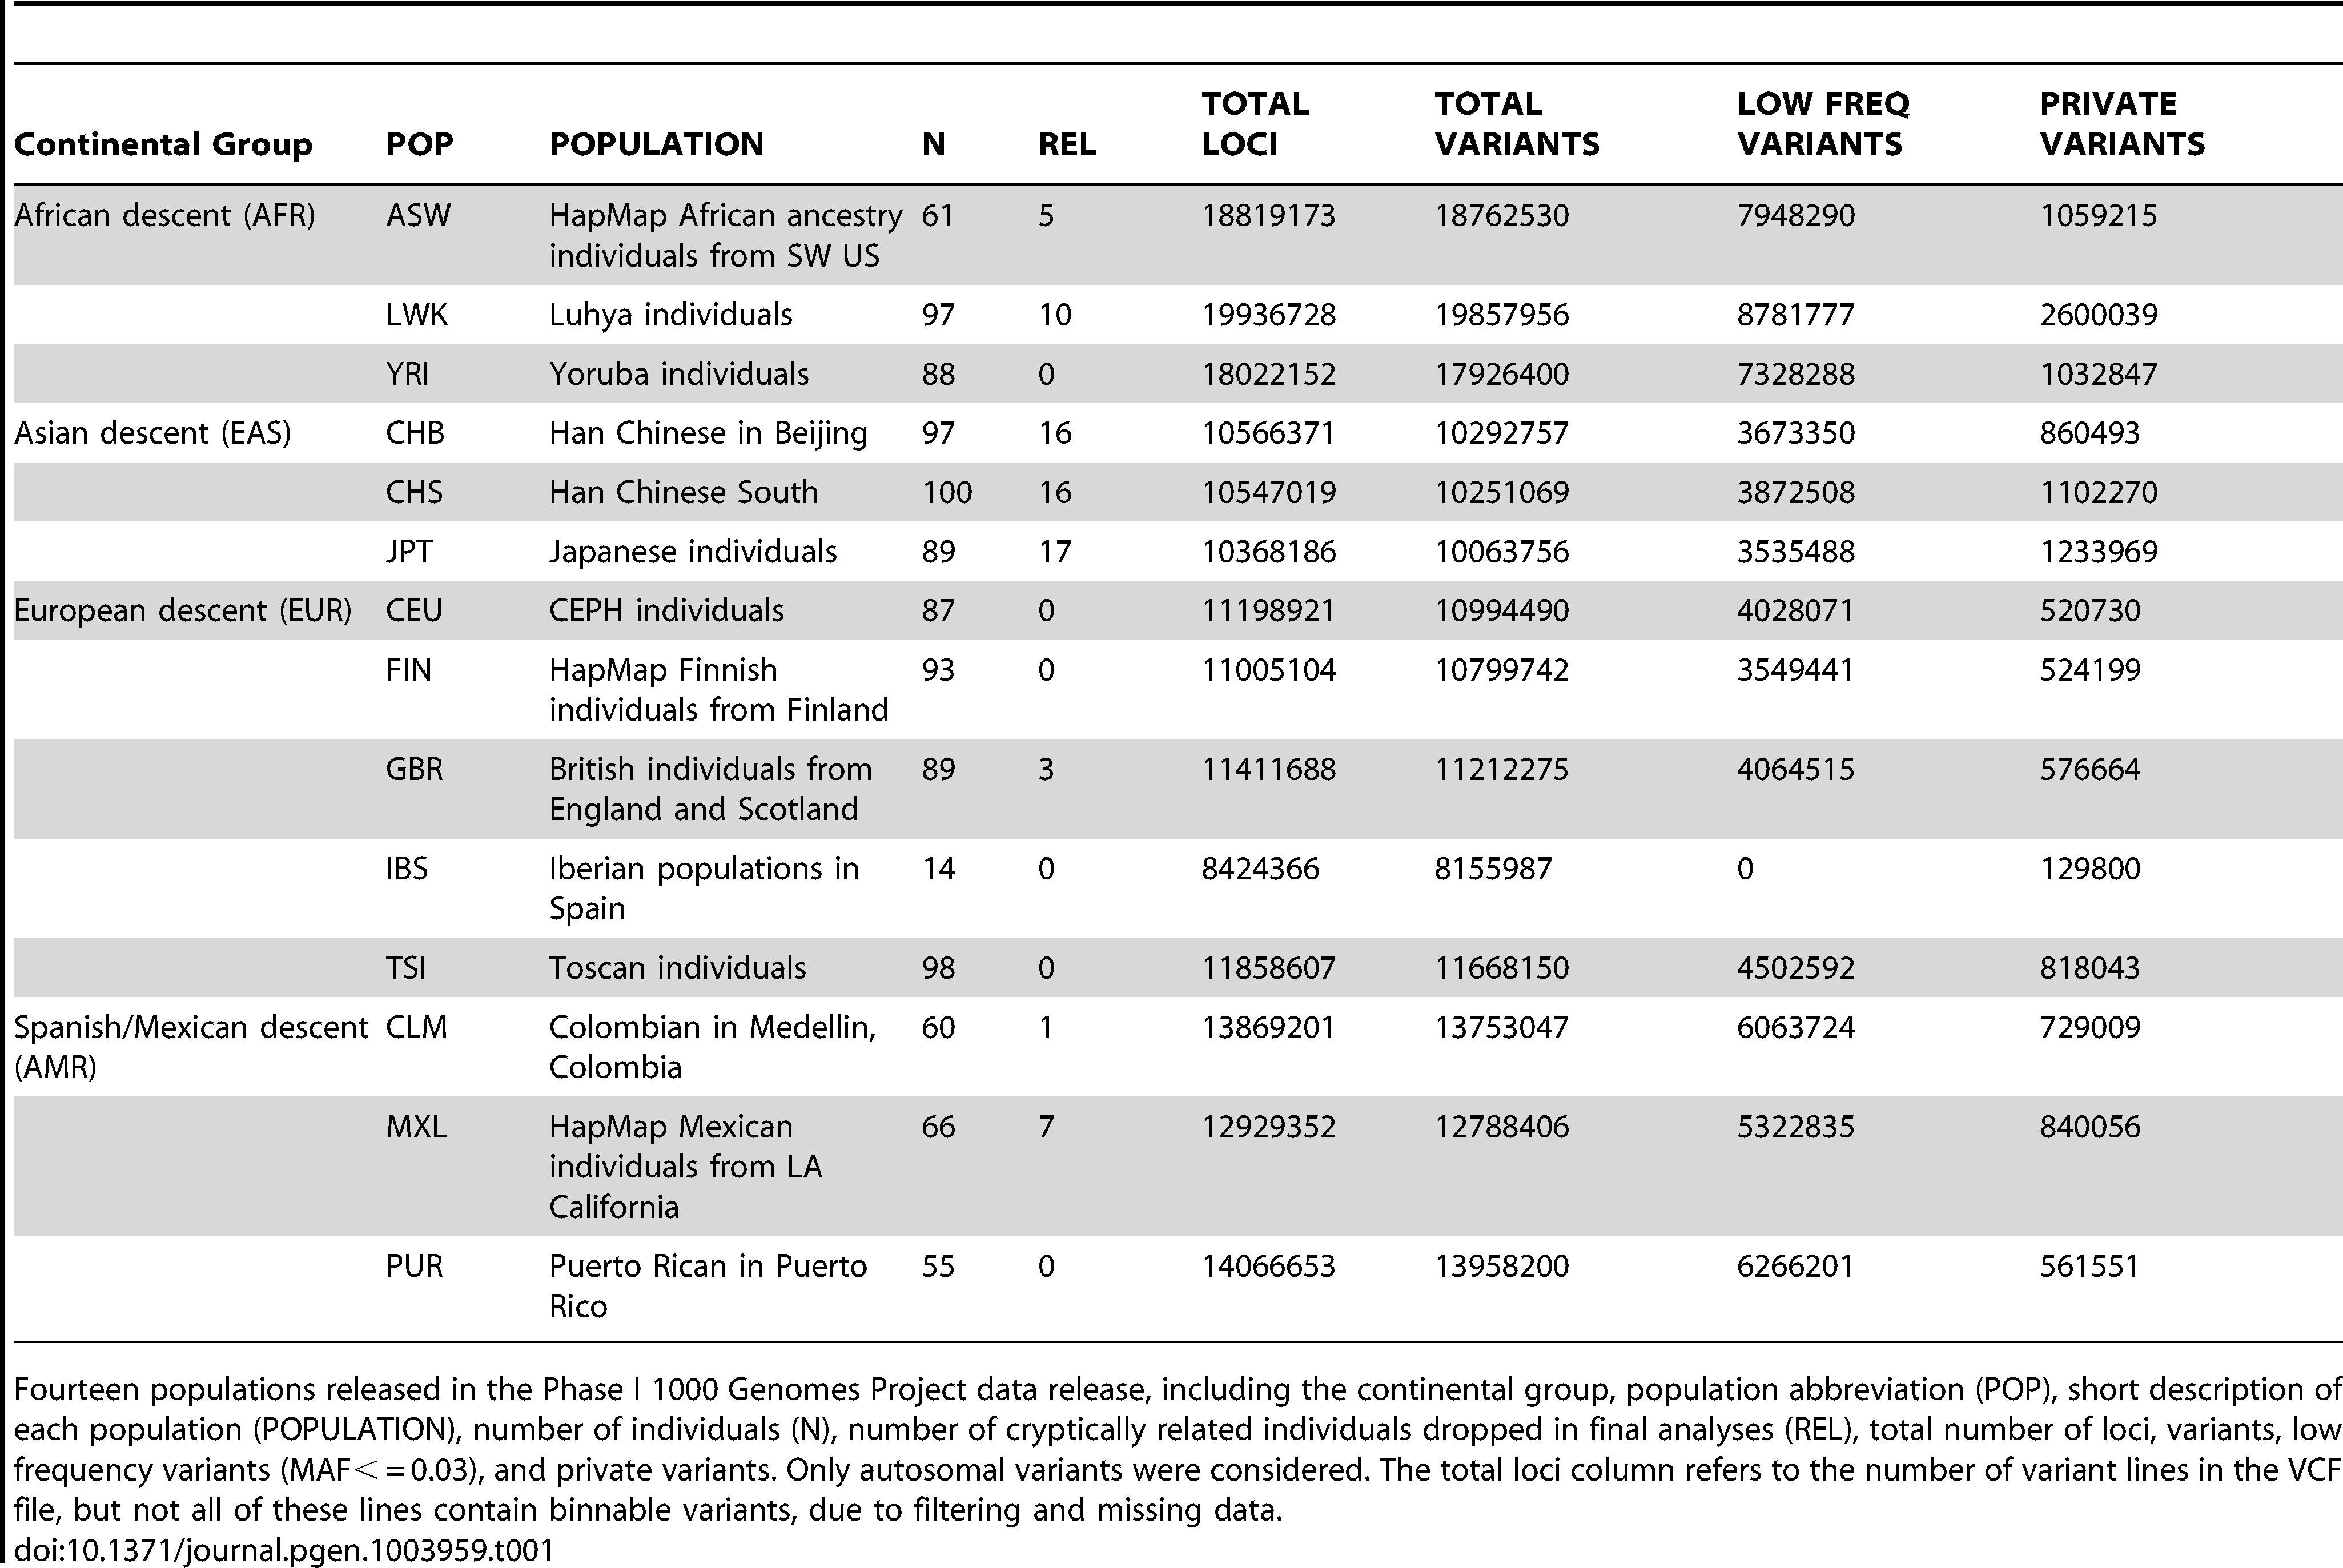 Phase I 1000 Genomes Project data characteristics.